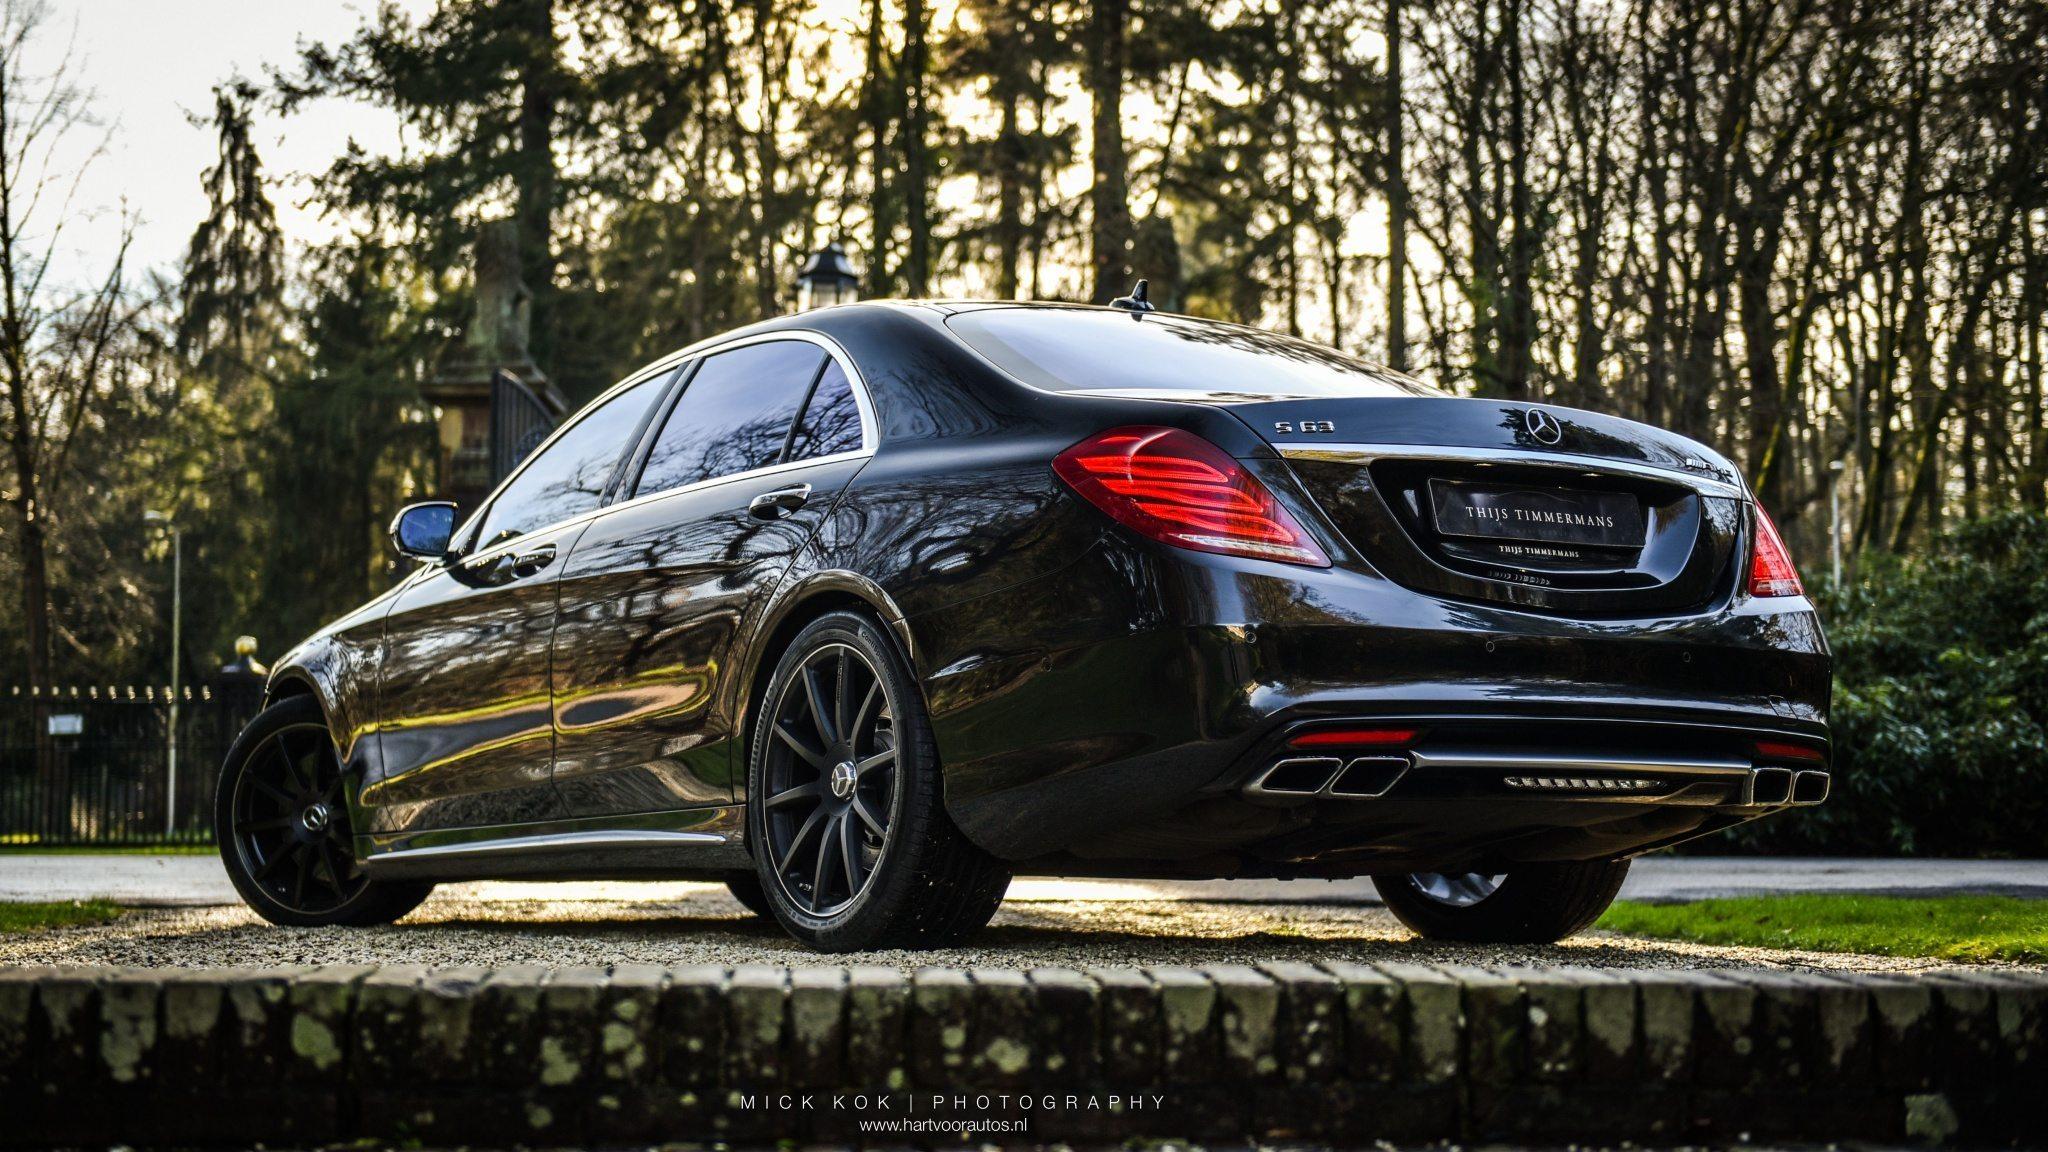 Mercedes-Benz S63 AMG - Hartvoorautos.nl